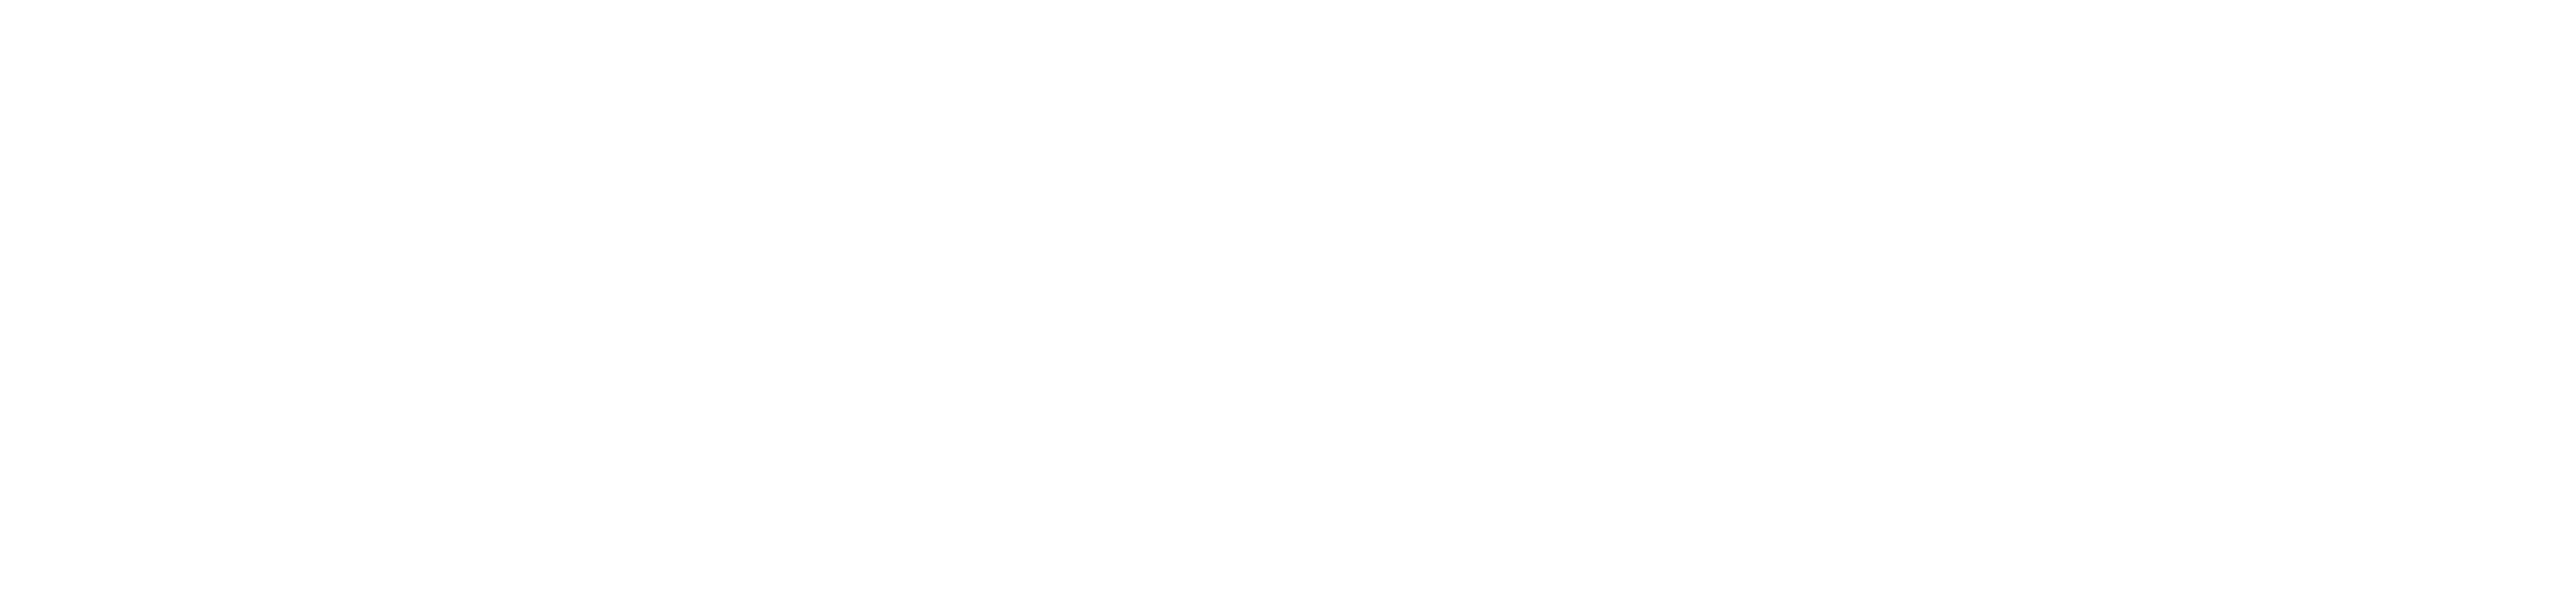 Logo image for TrendZone